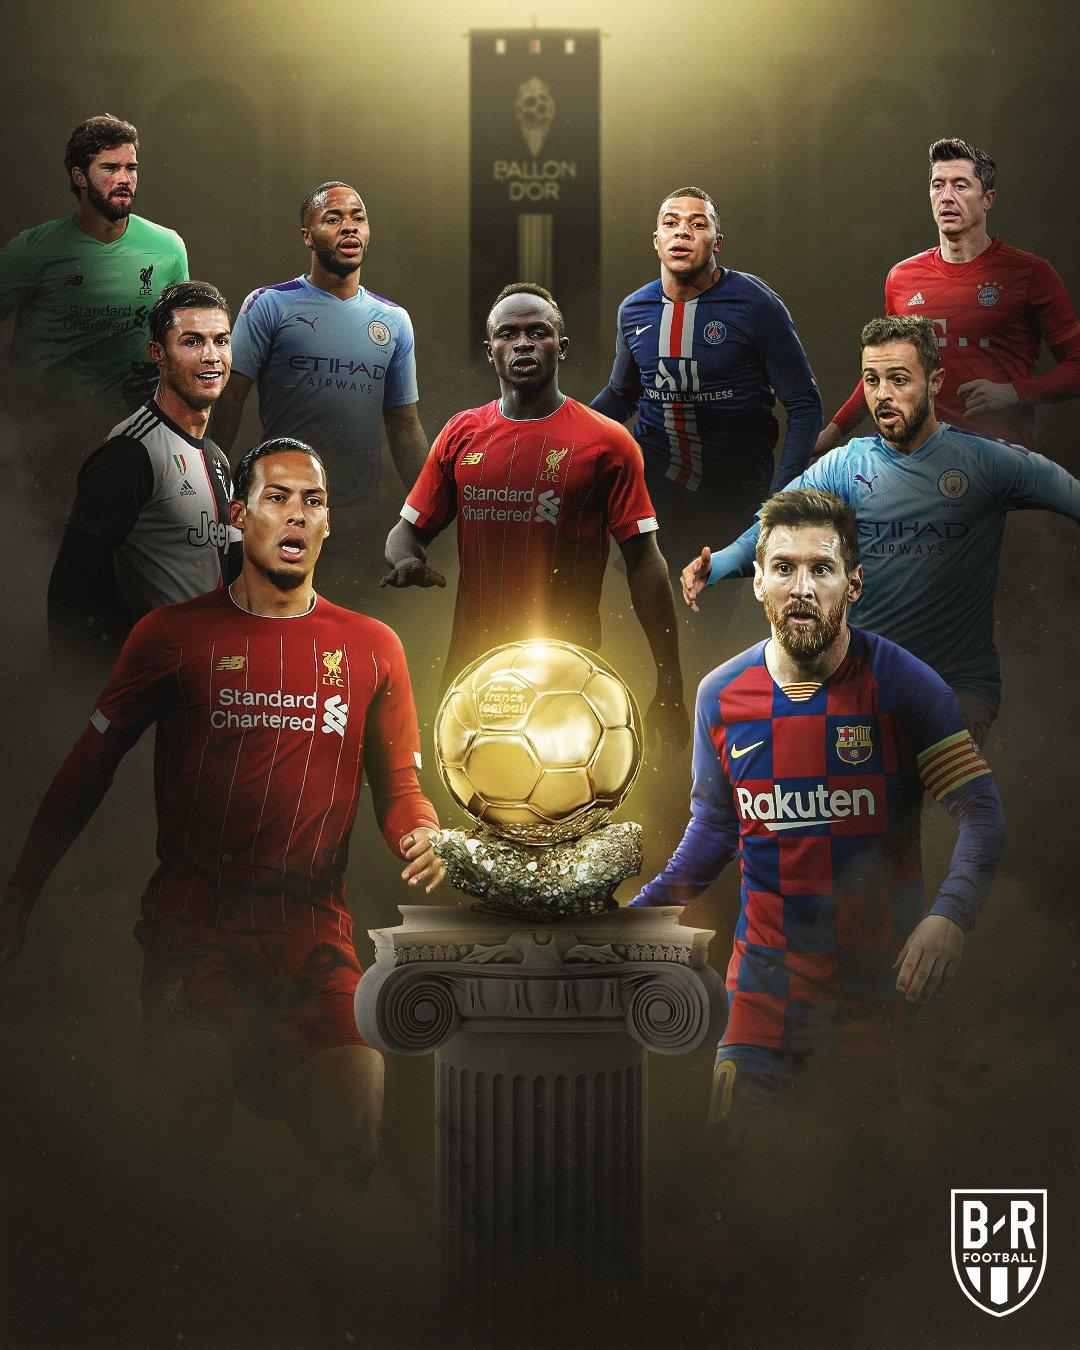 B/R海报:谁能加冕2019年金球奖?让我们拭目以待